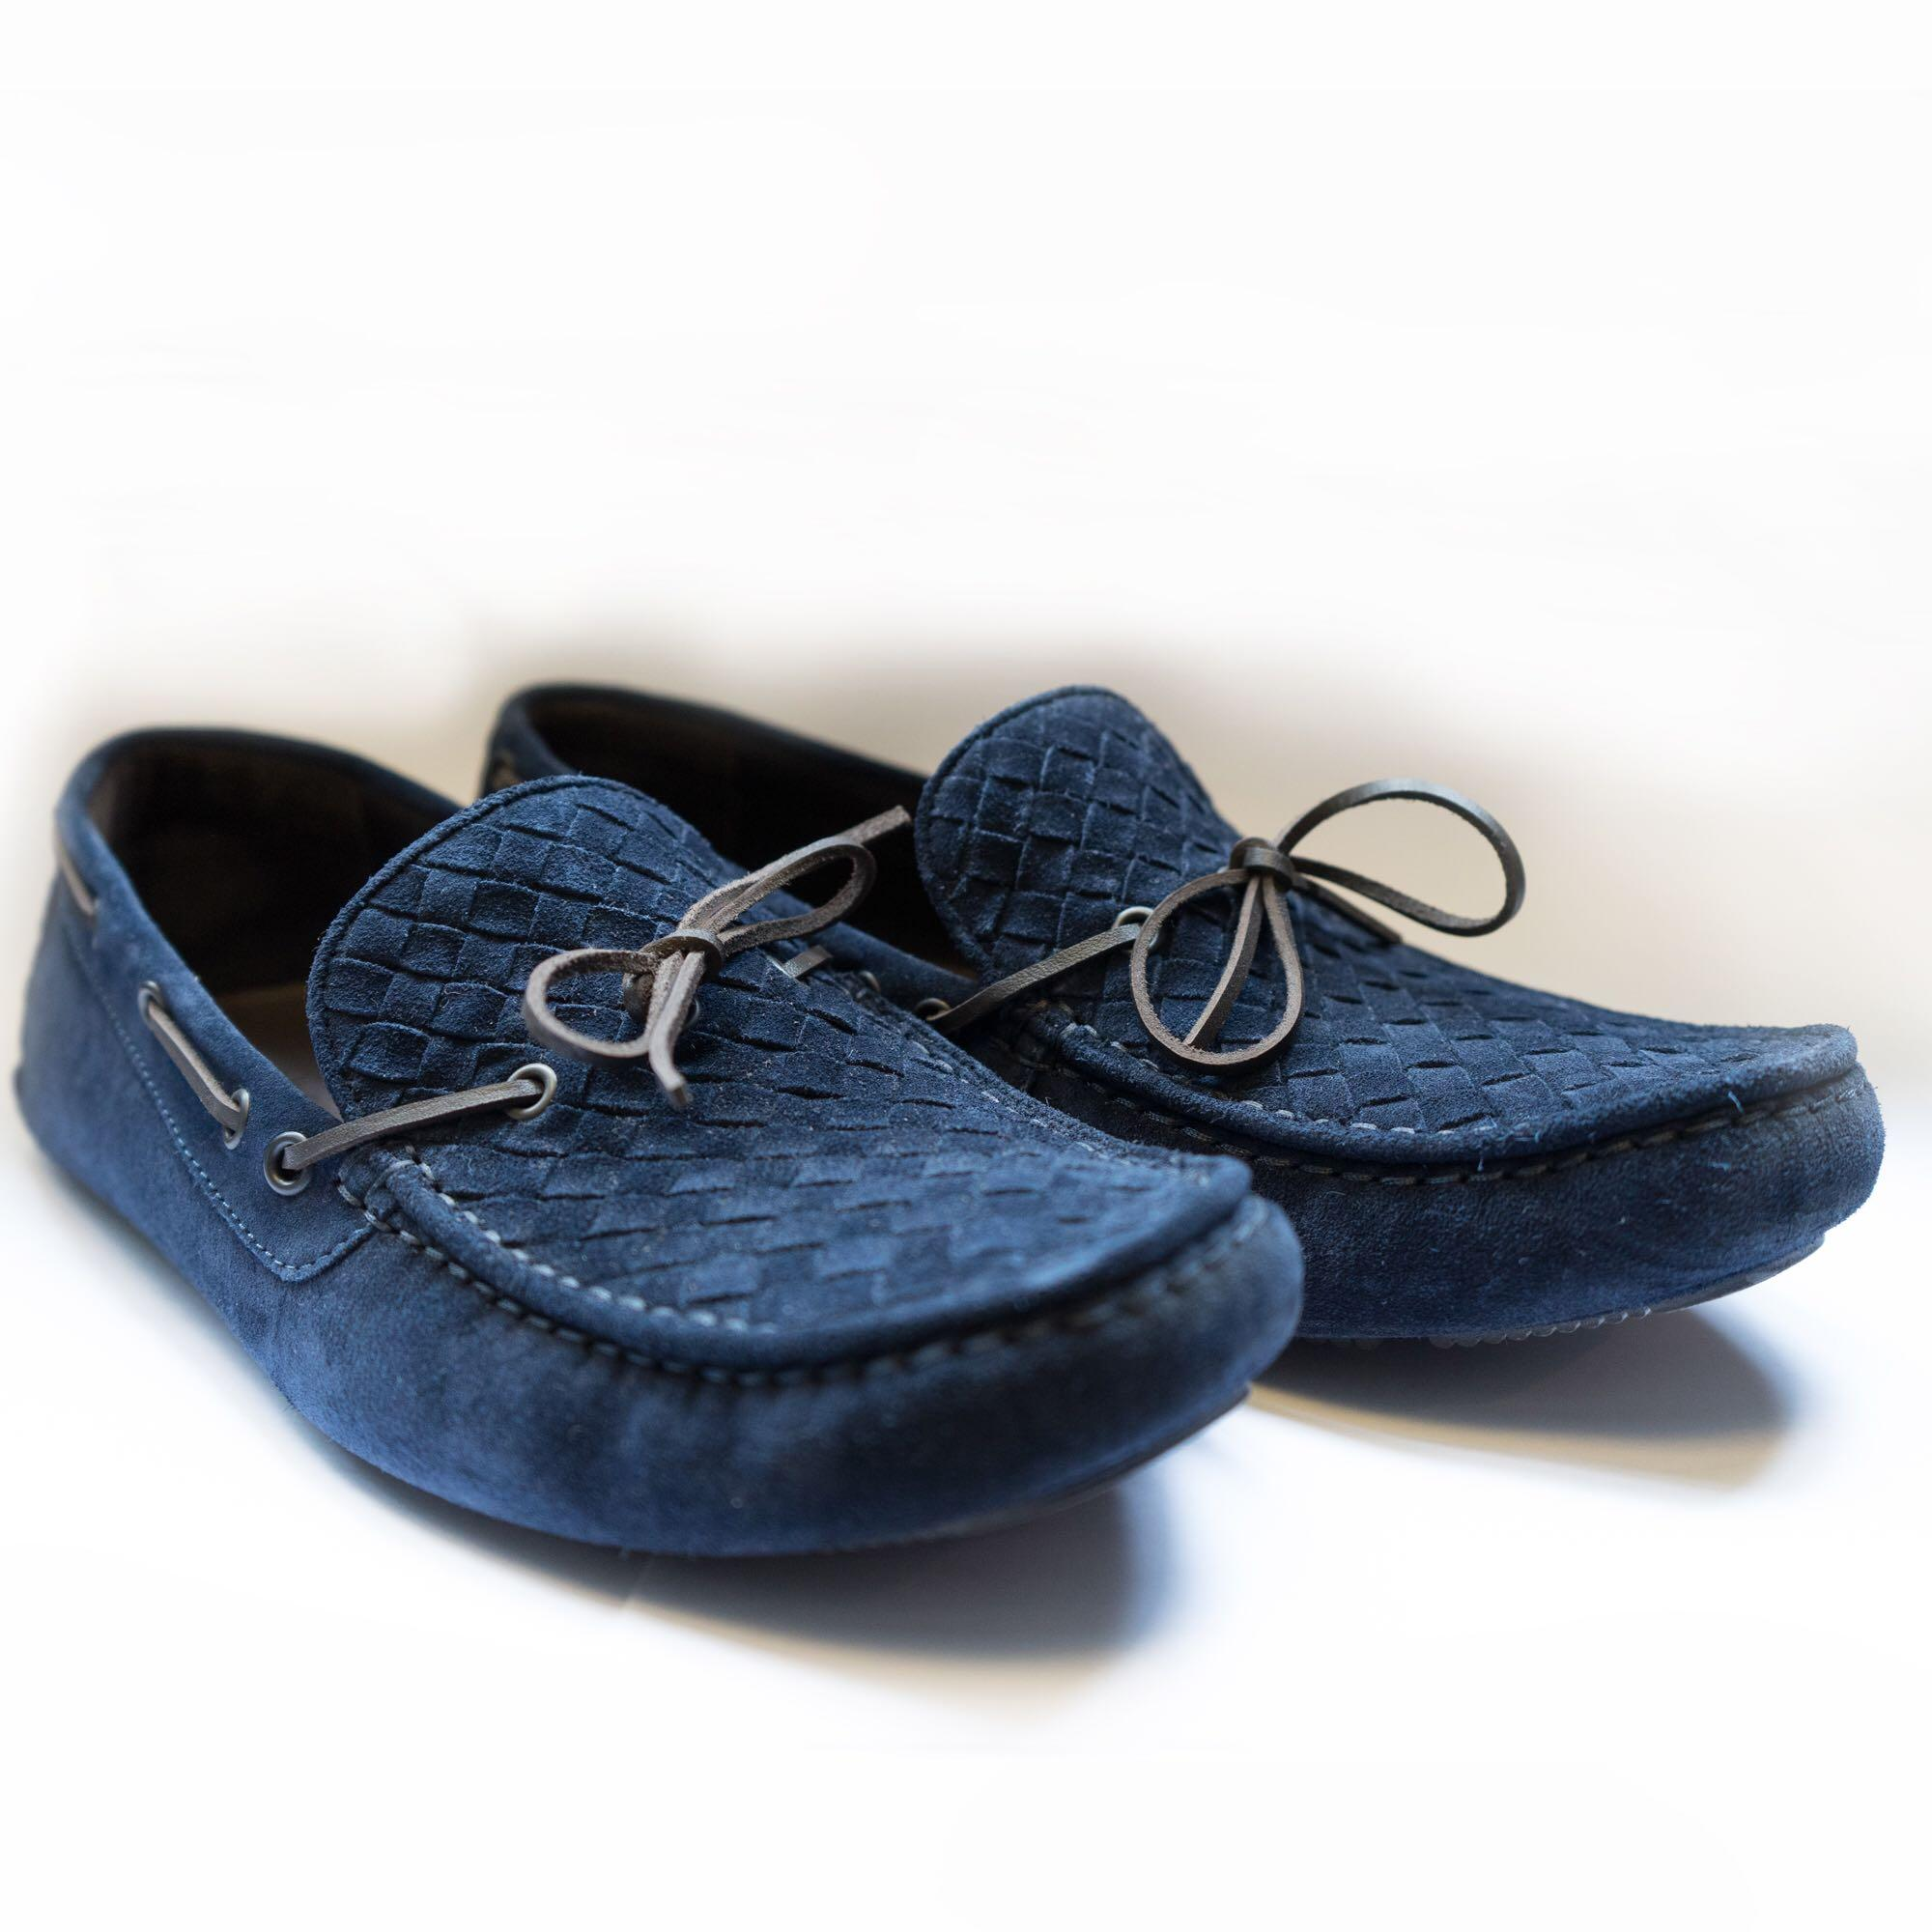 Bottega Veneta Suede Loafers, Luxury